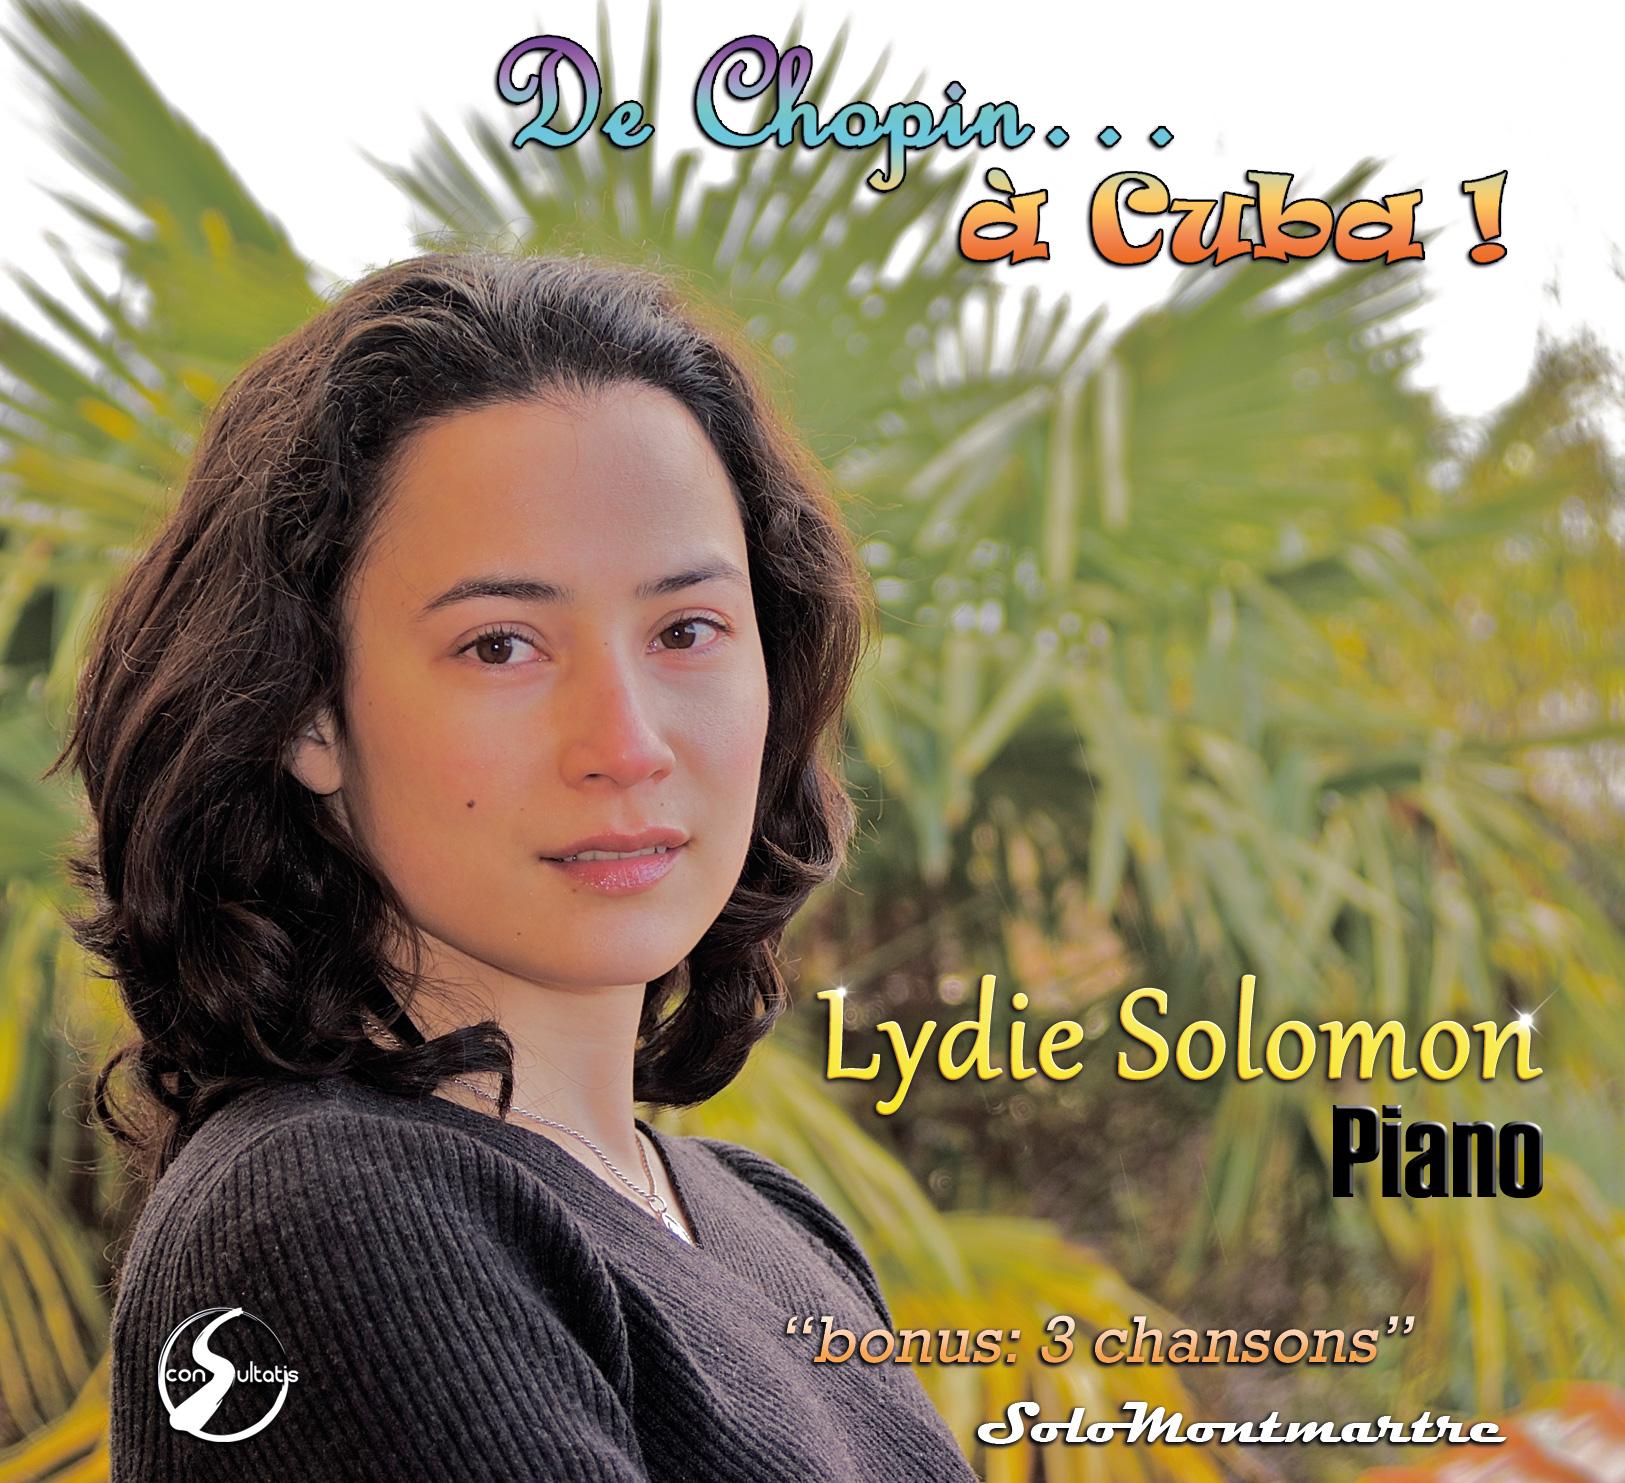 lydie-solomon-de-chopin-a-cuba